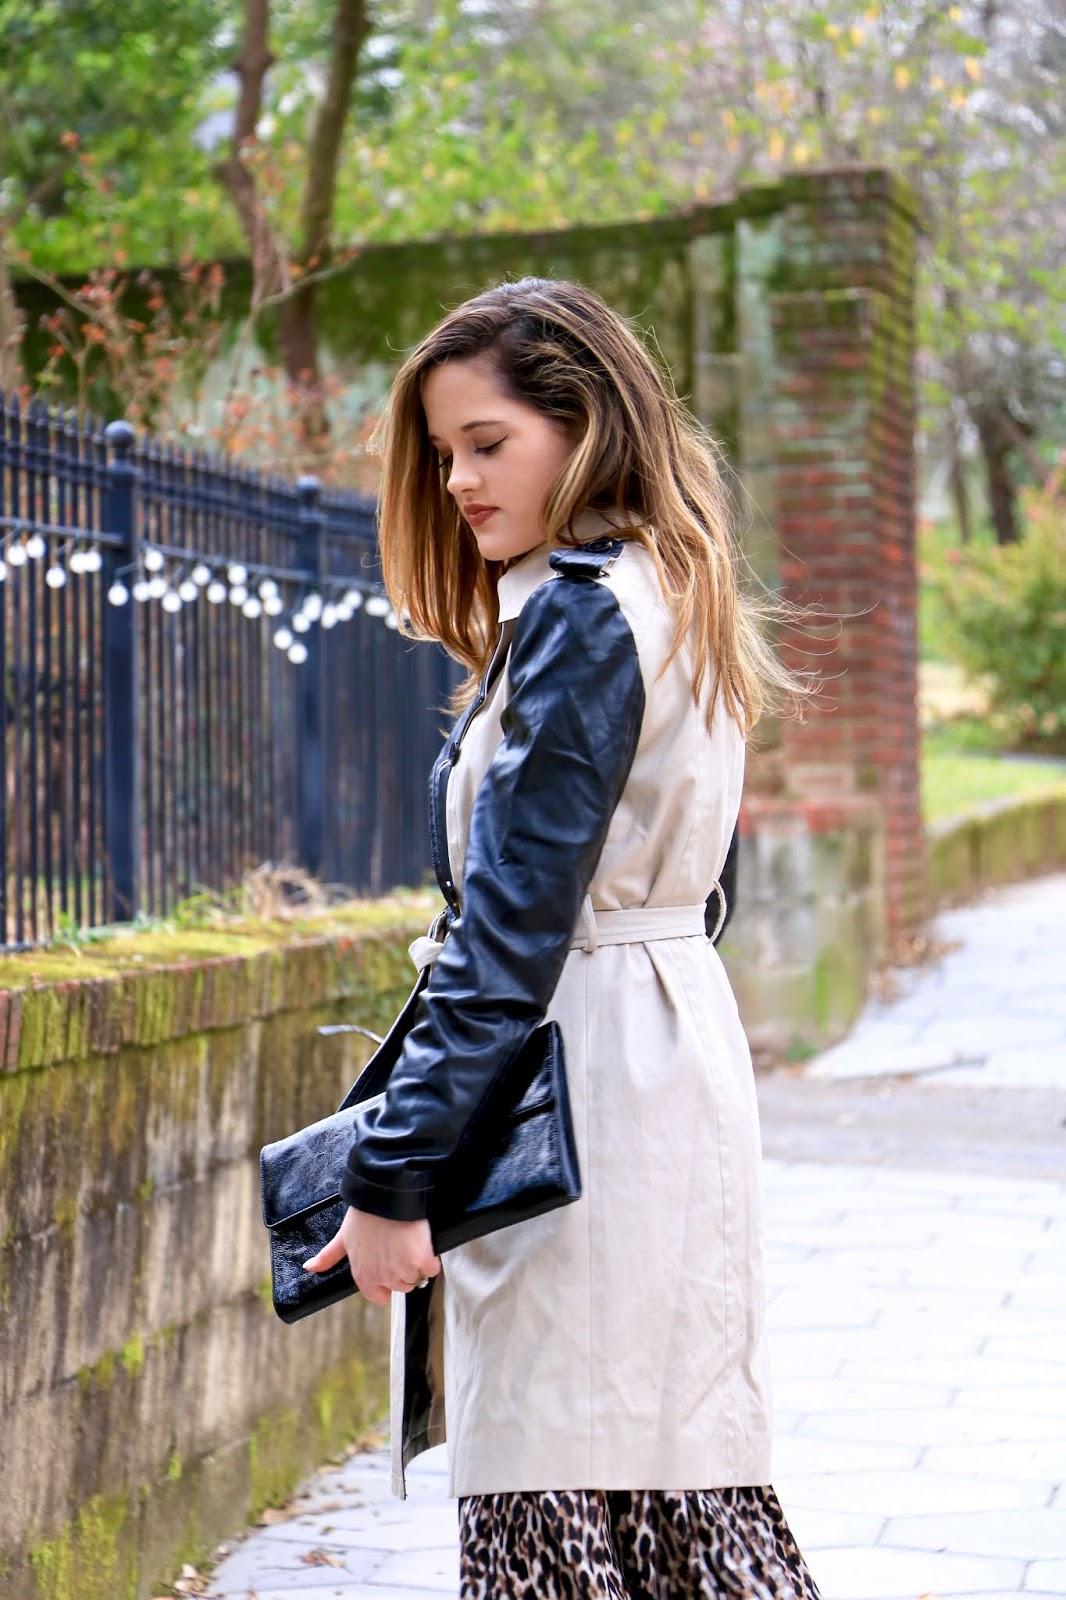 Nyc fashion blogger Kathleen Harper wearing 2020's biggest spring trends.